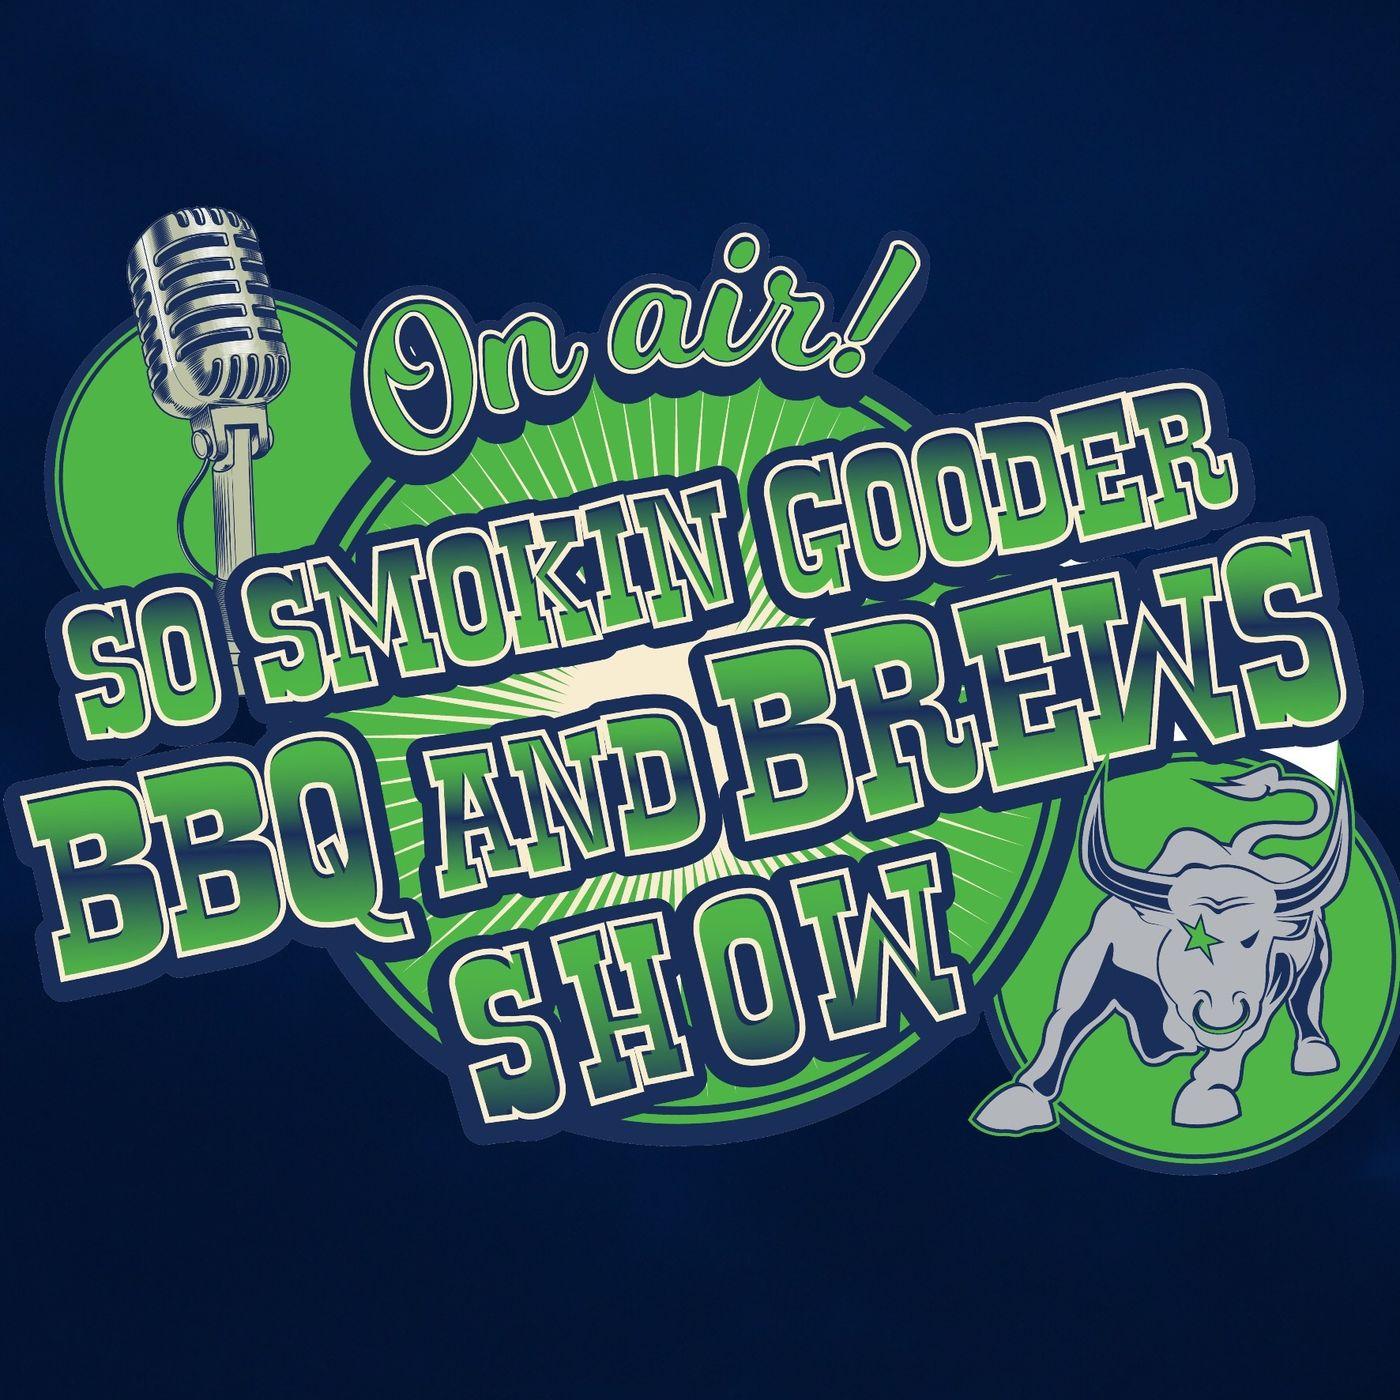 So Smokin' Gooder BBQ and Brews Show